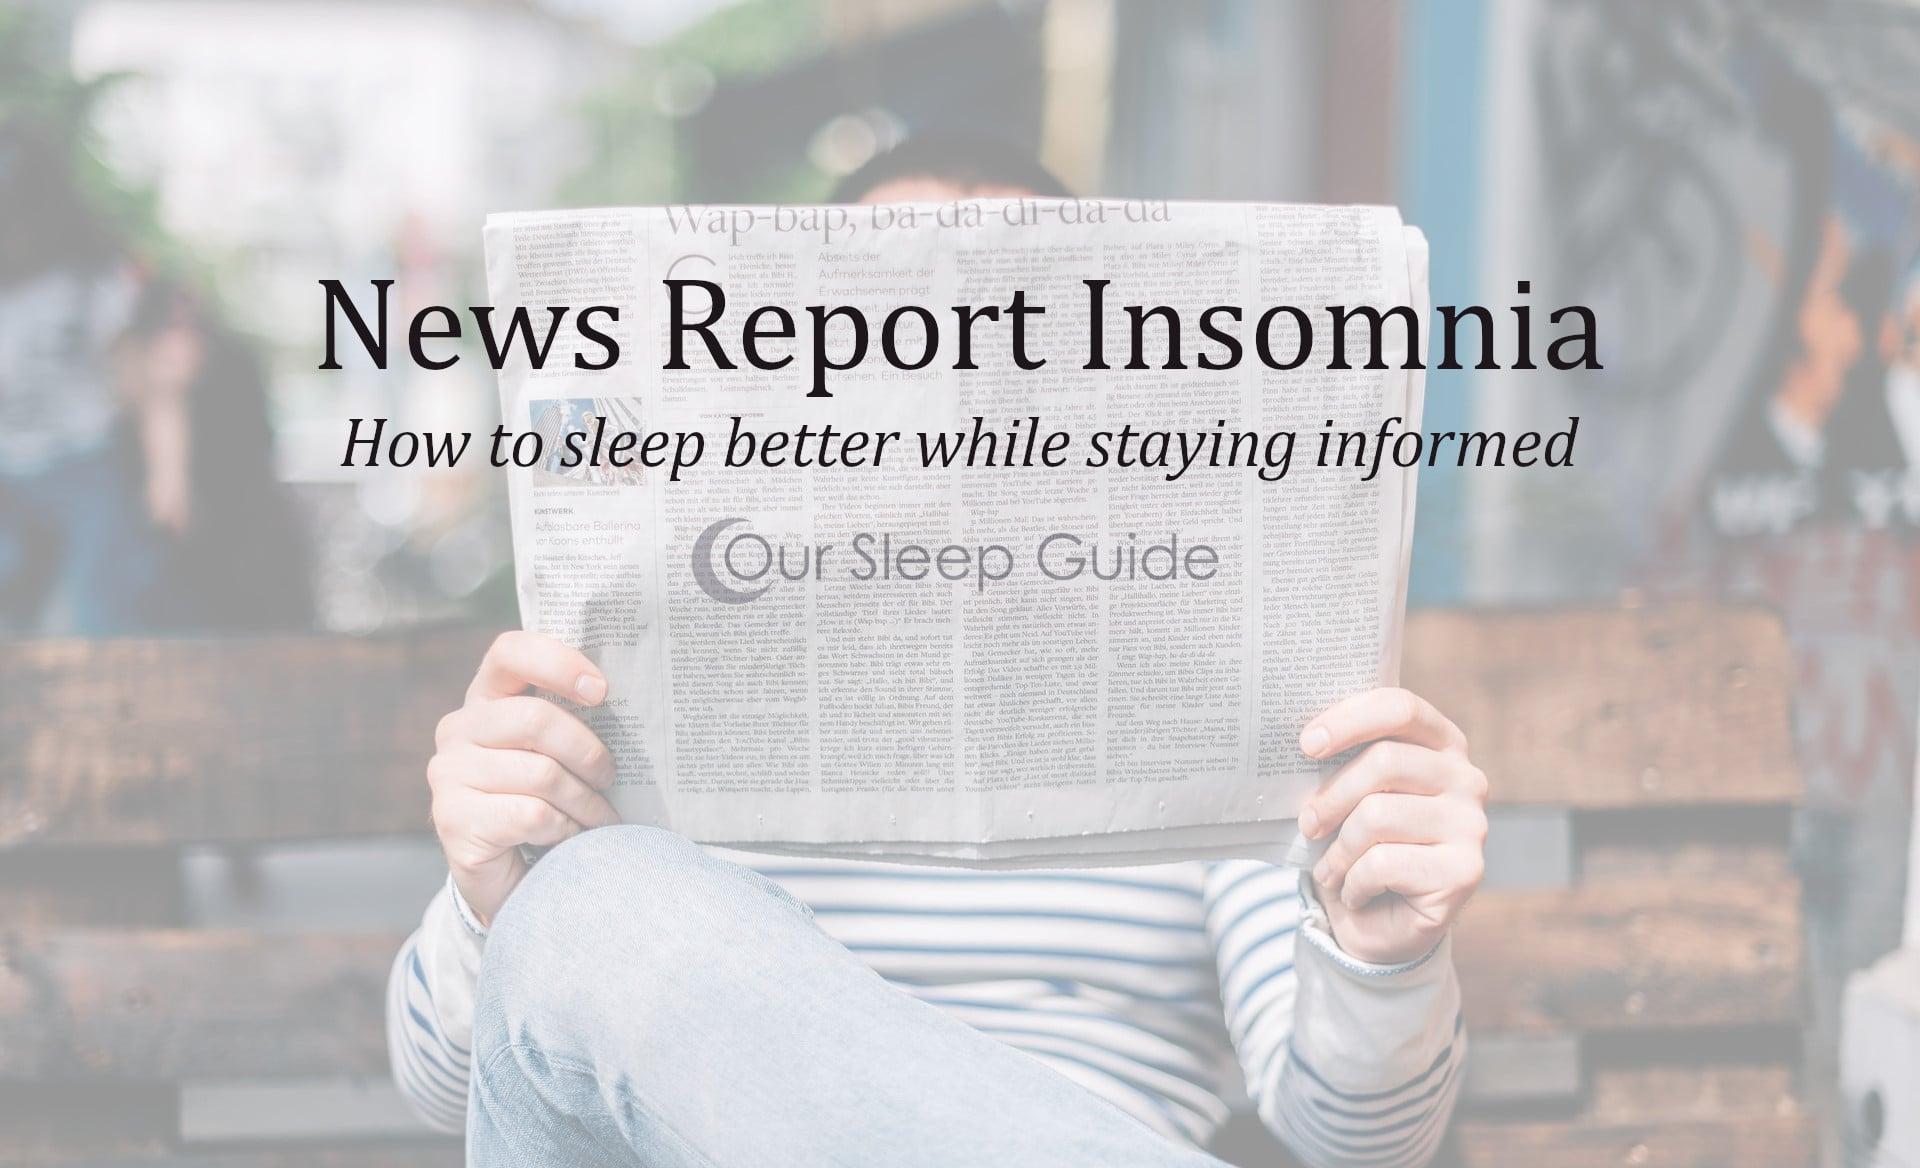 new report insomnia